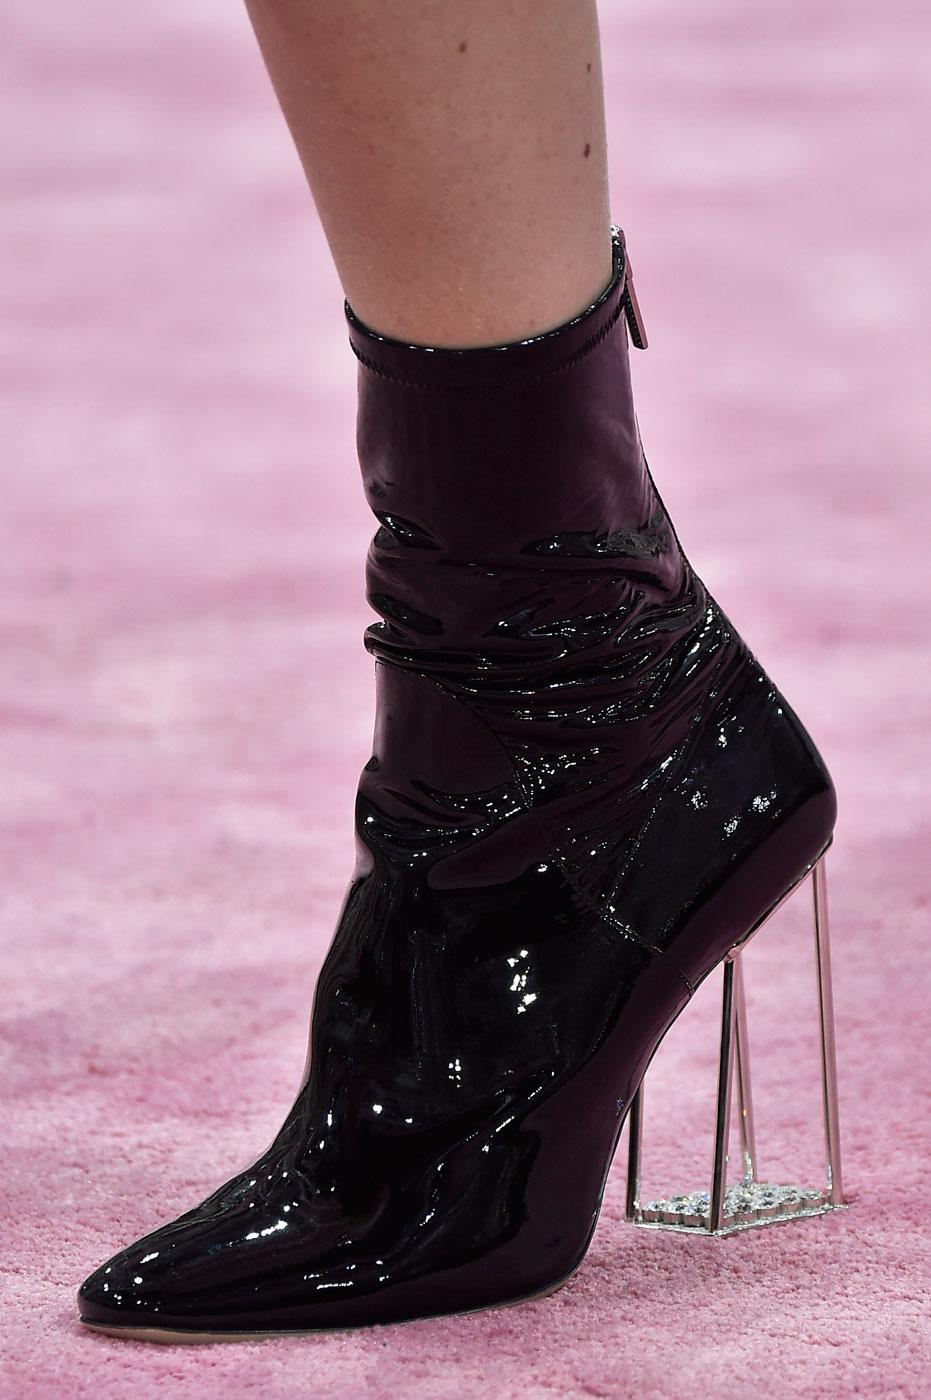 Christian-Dior-fashion-runway-show-close-ups-haute-couture-paris-spring-summer-2015-the-impression-161